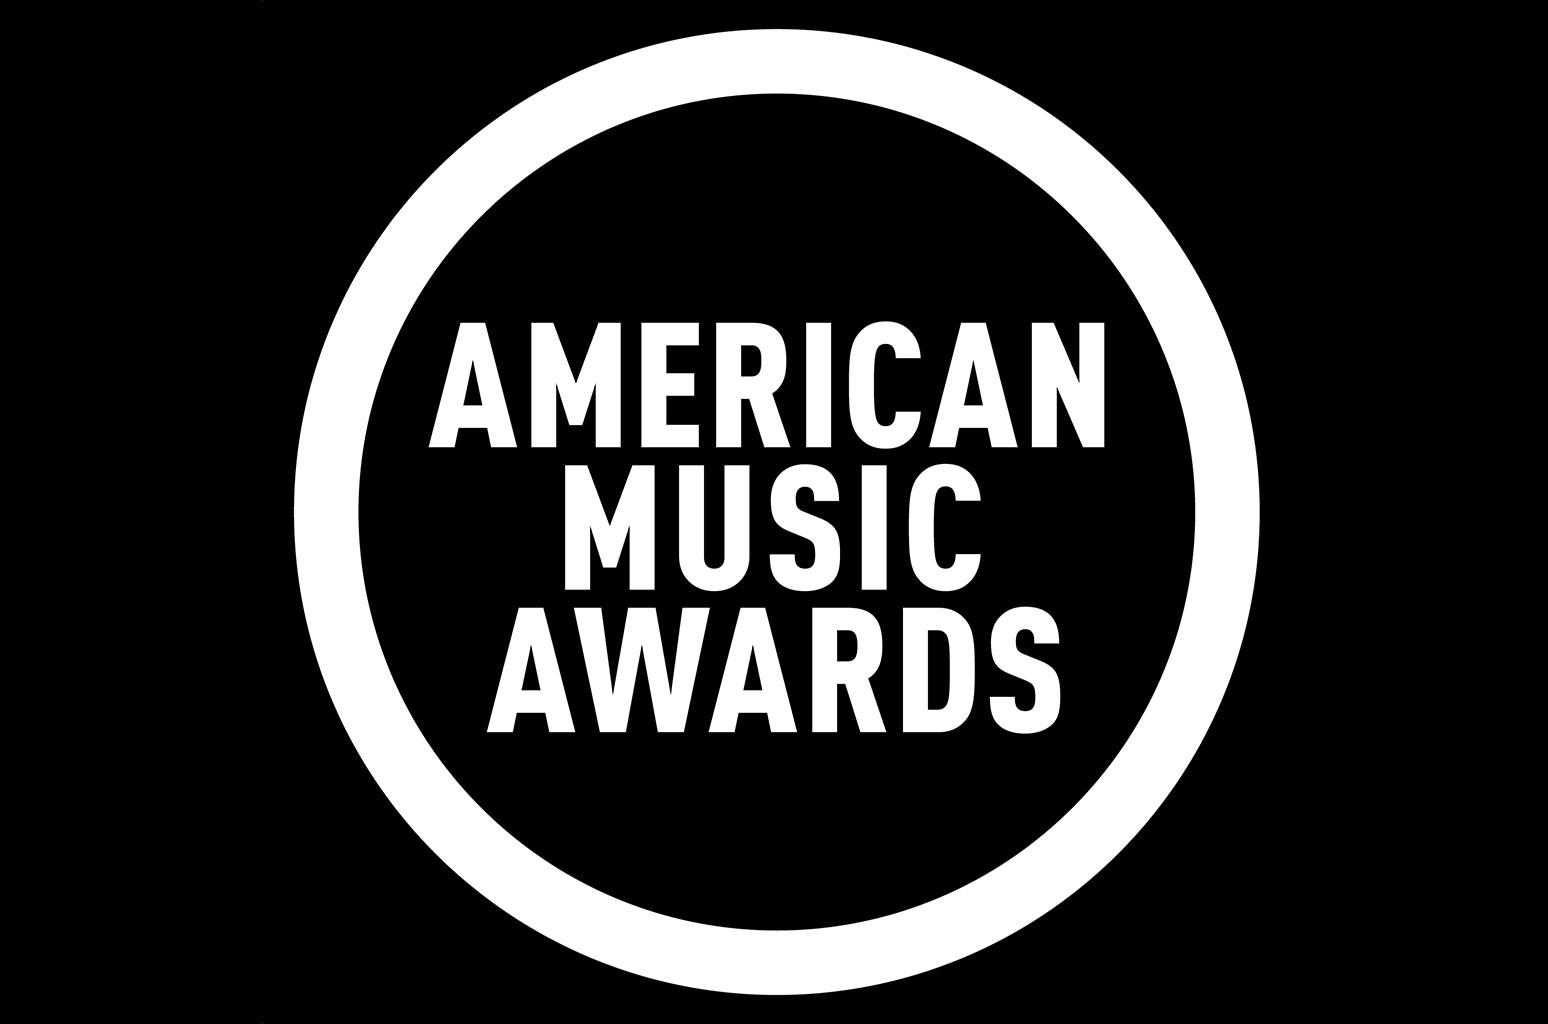 american-music-awards-ama-logo-2019-billboard-1548-1574641532